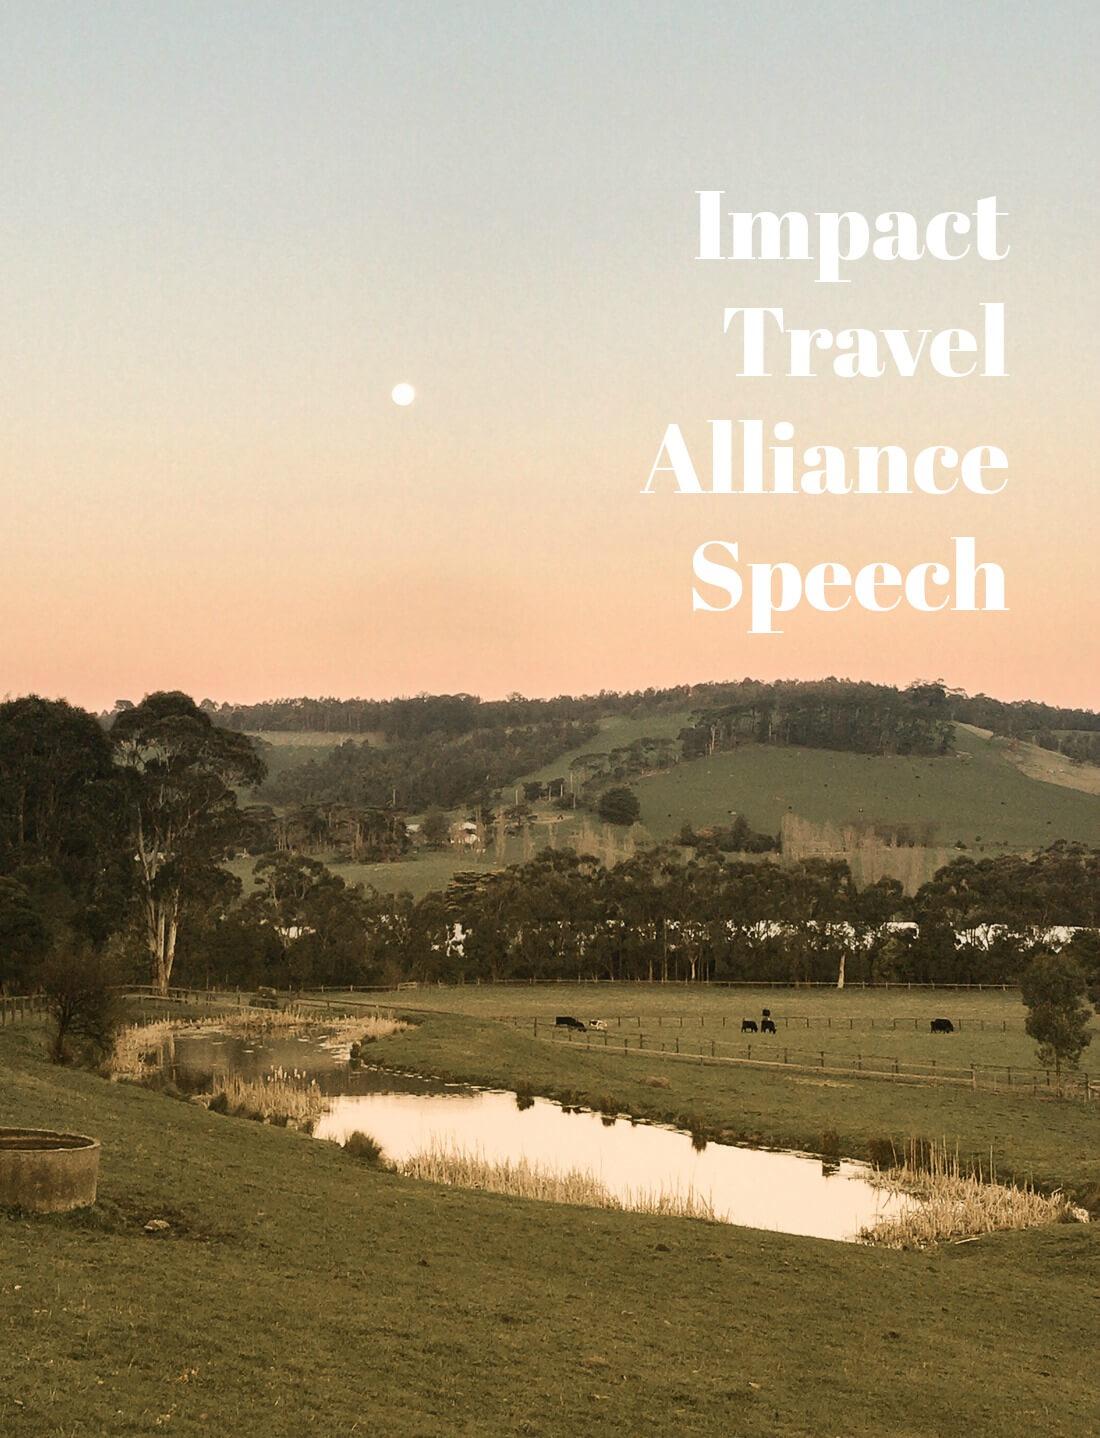 PROGRESS OVER PERFECTION – MY IMPACT TRAVEL ALLIANCE SPEECH